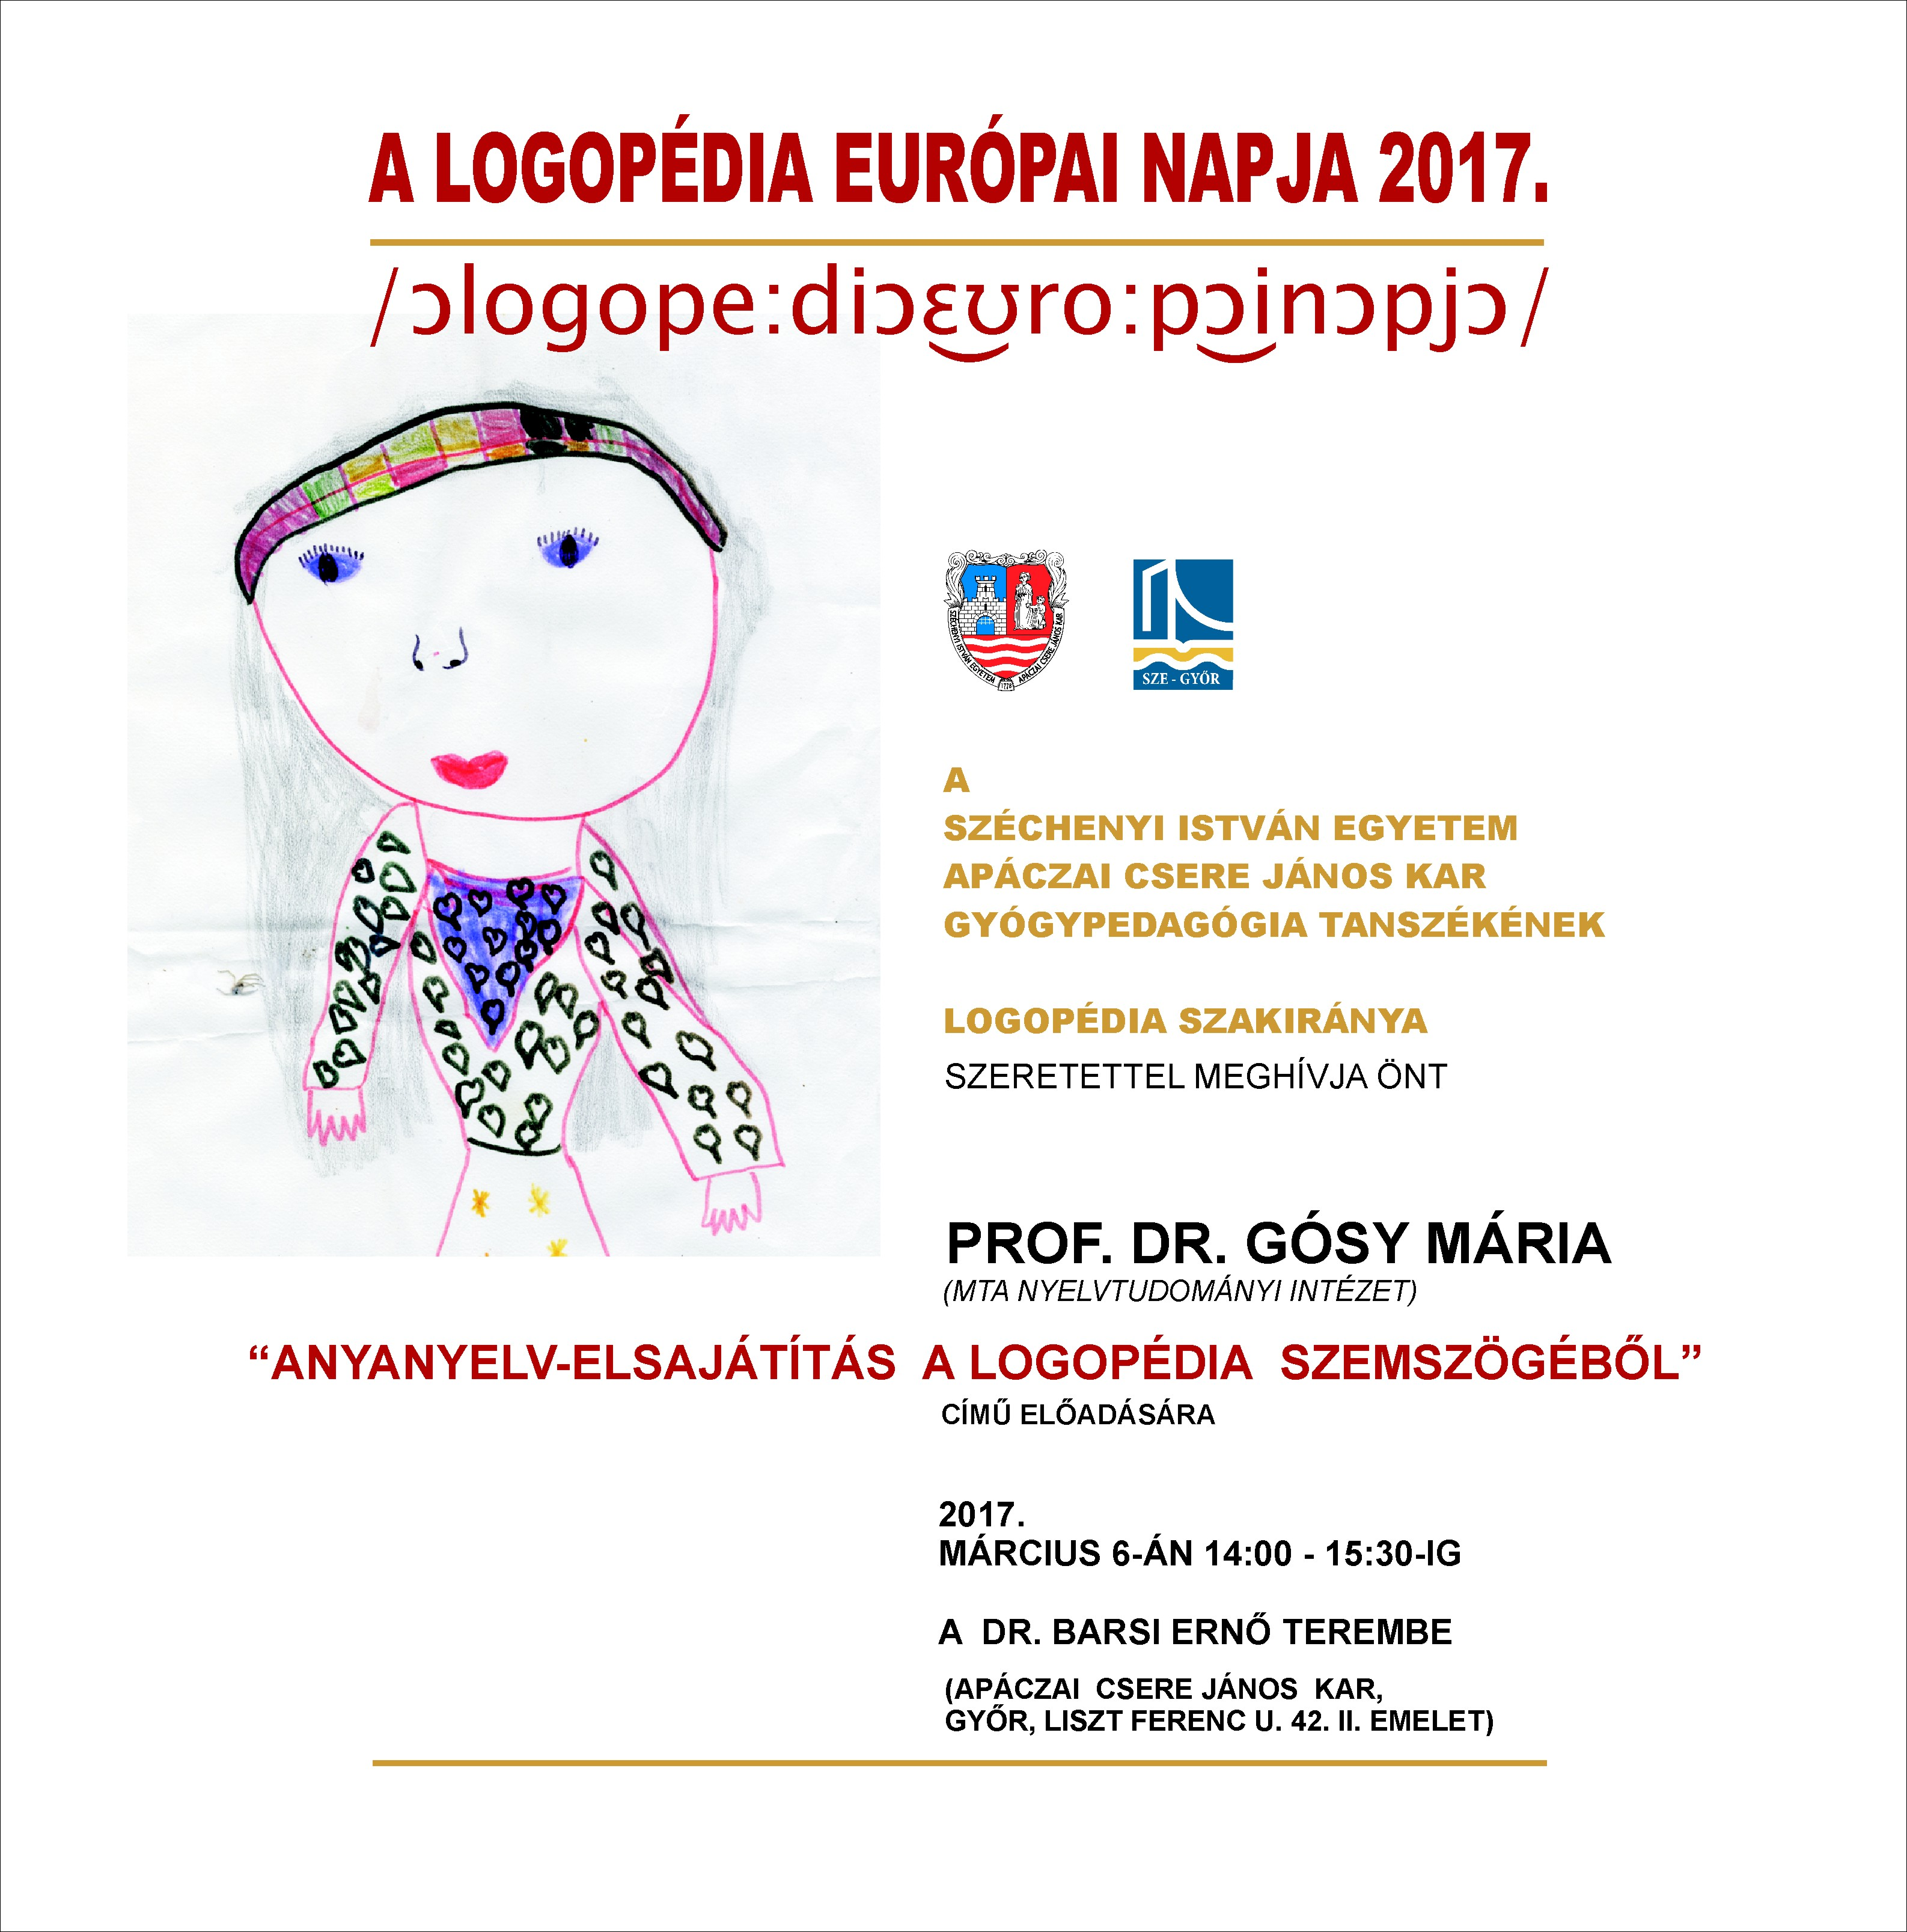 Logopédia európai napja